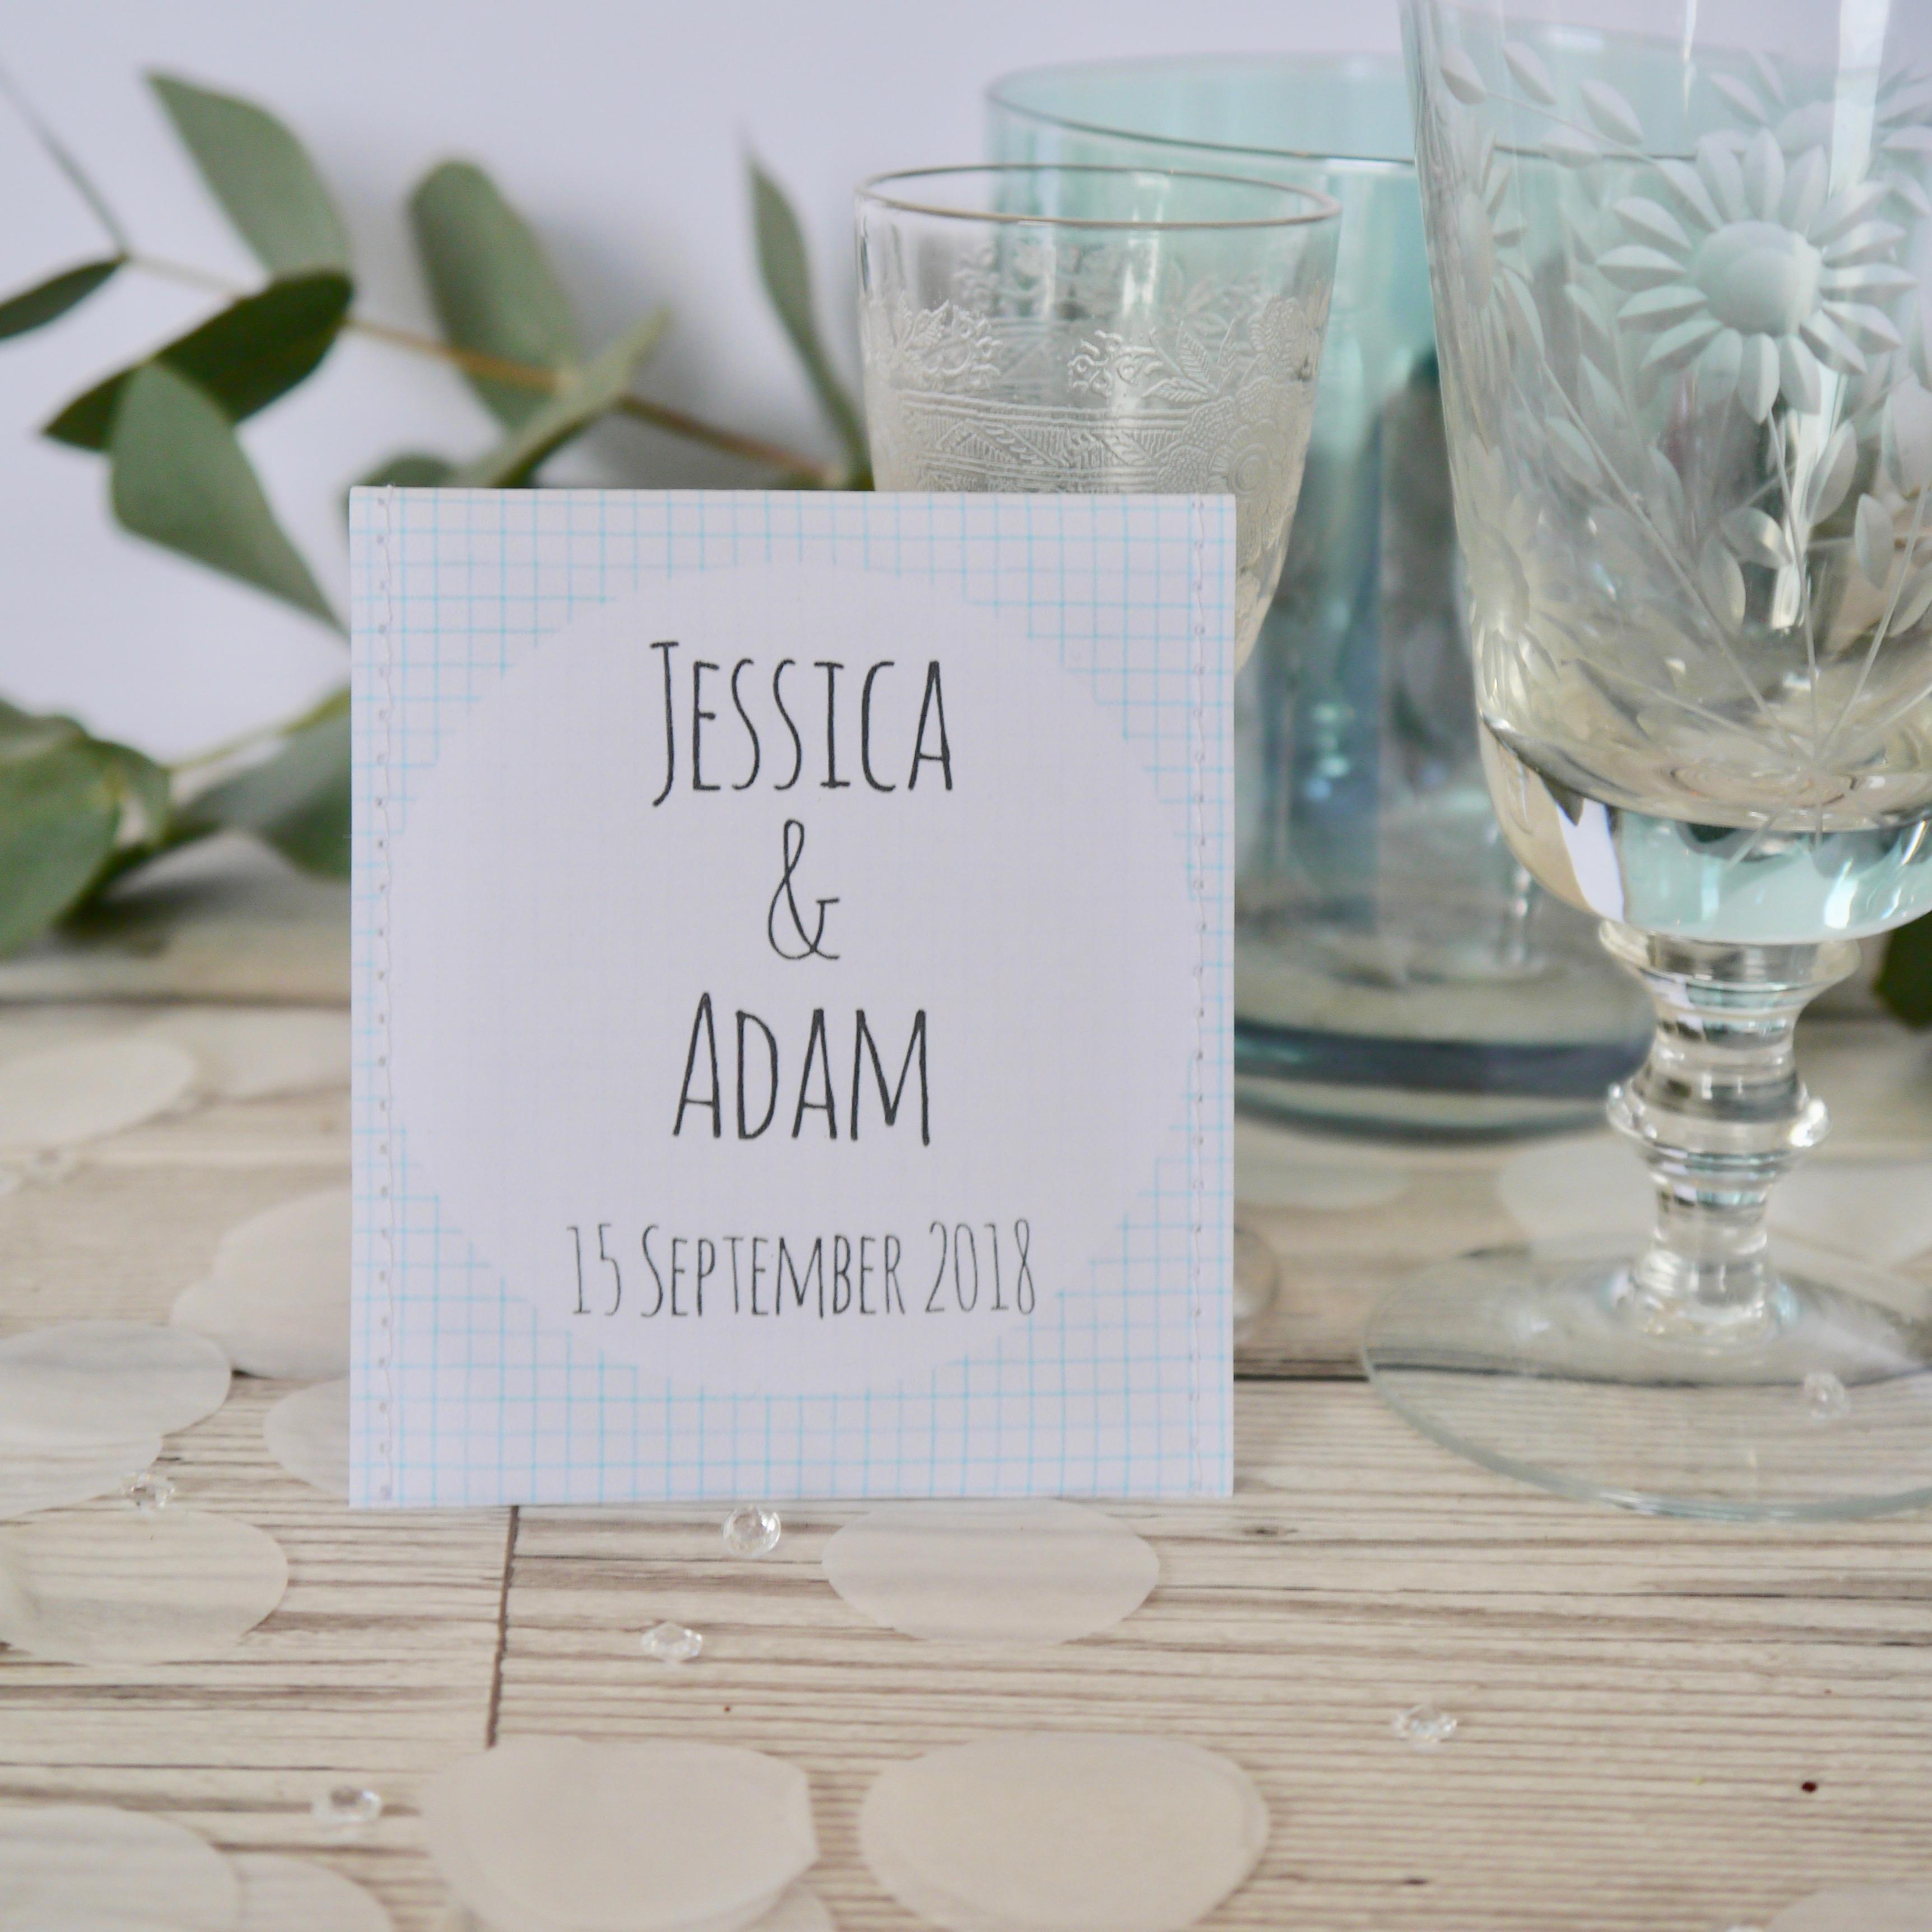 Teabag wedding favours with blue grid design - Victoria Mae Designs